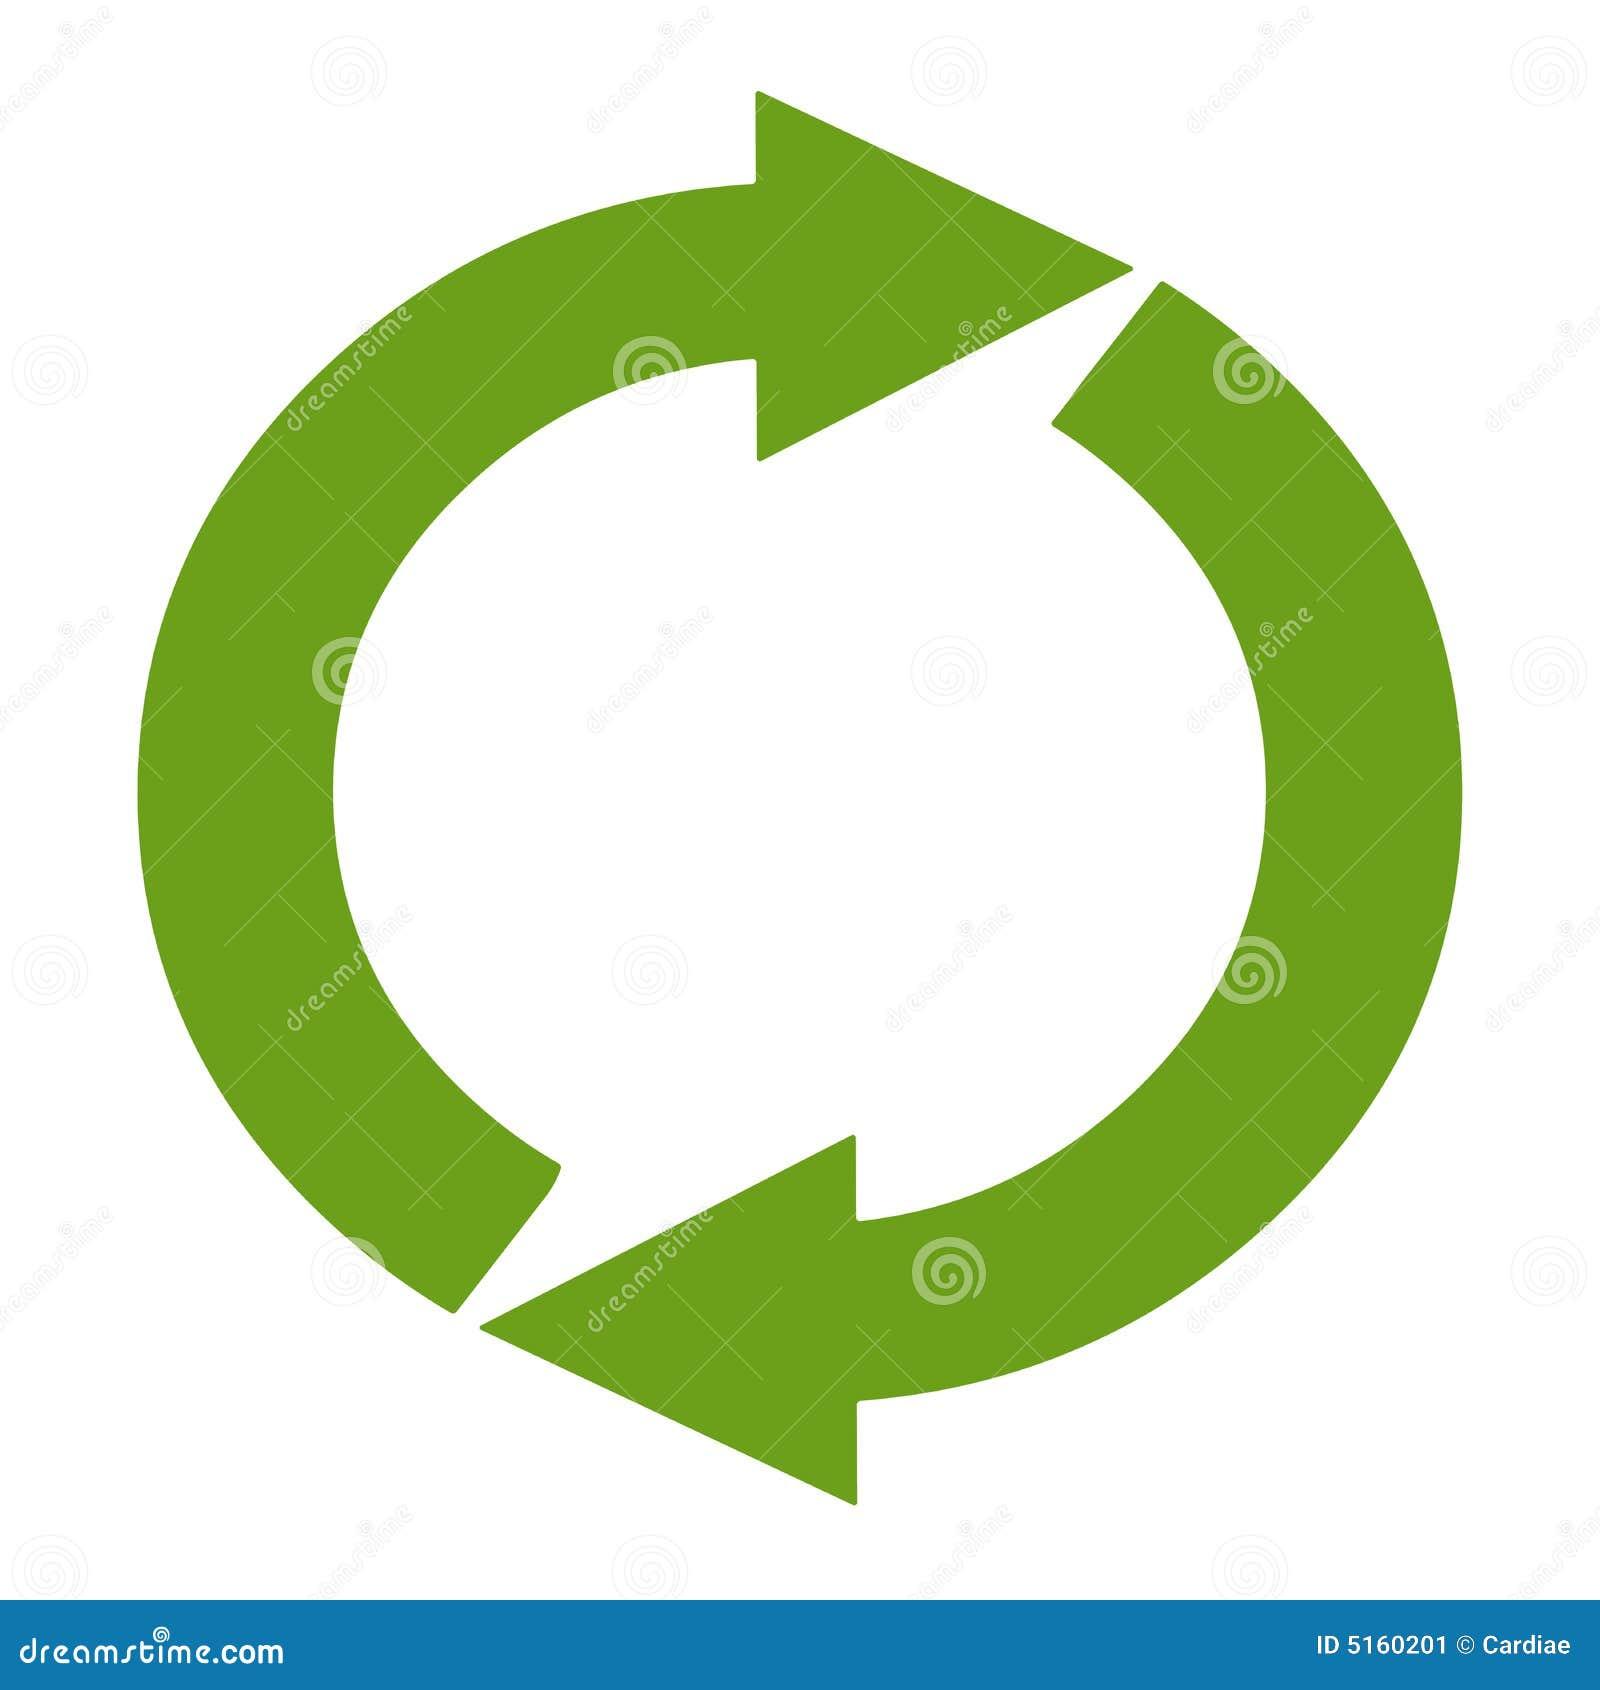 Blank recycling symbol sign environment stock illustration blank recycling symbol sign environment biocorpaavc Choice Image